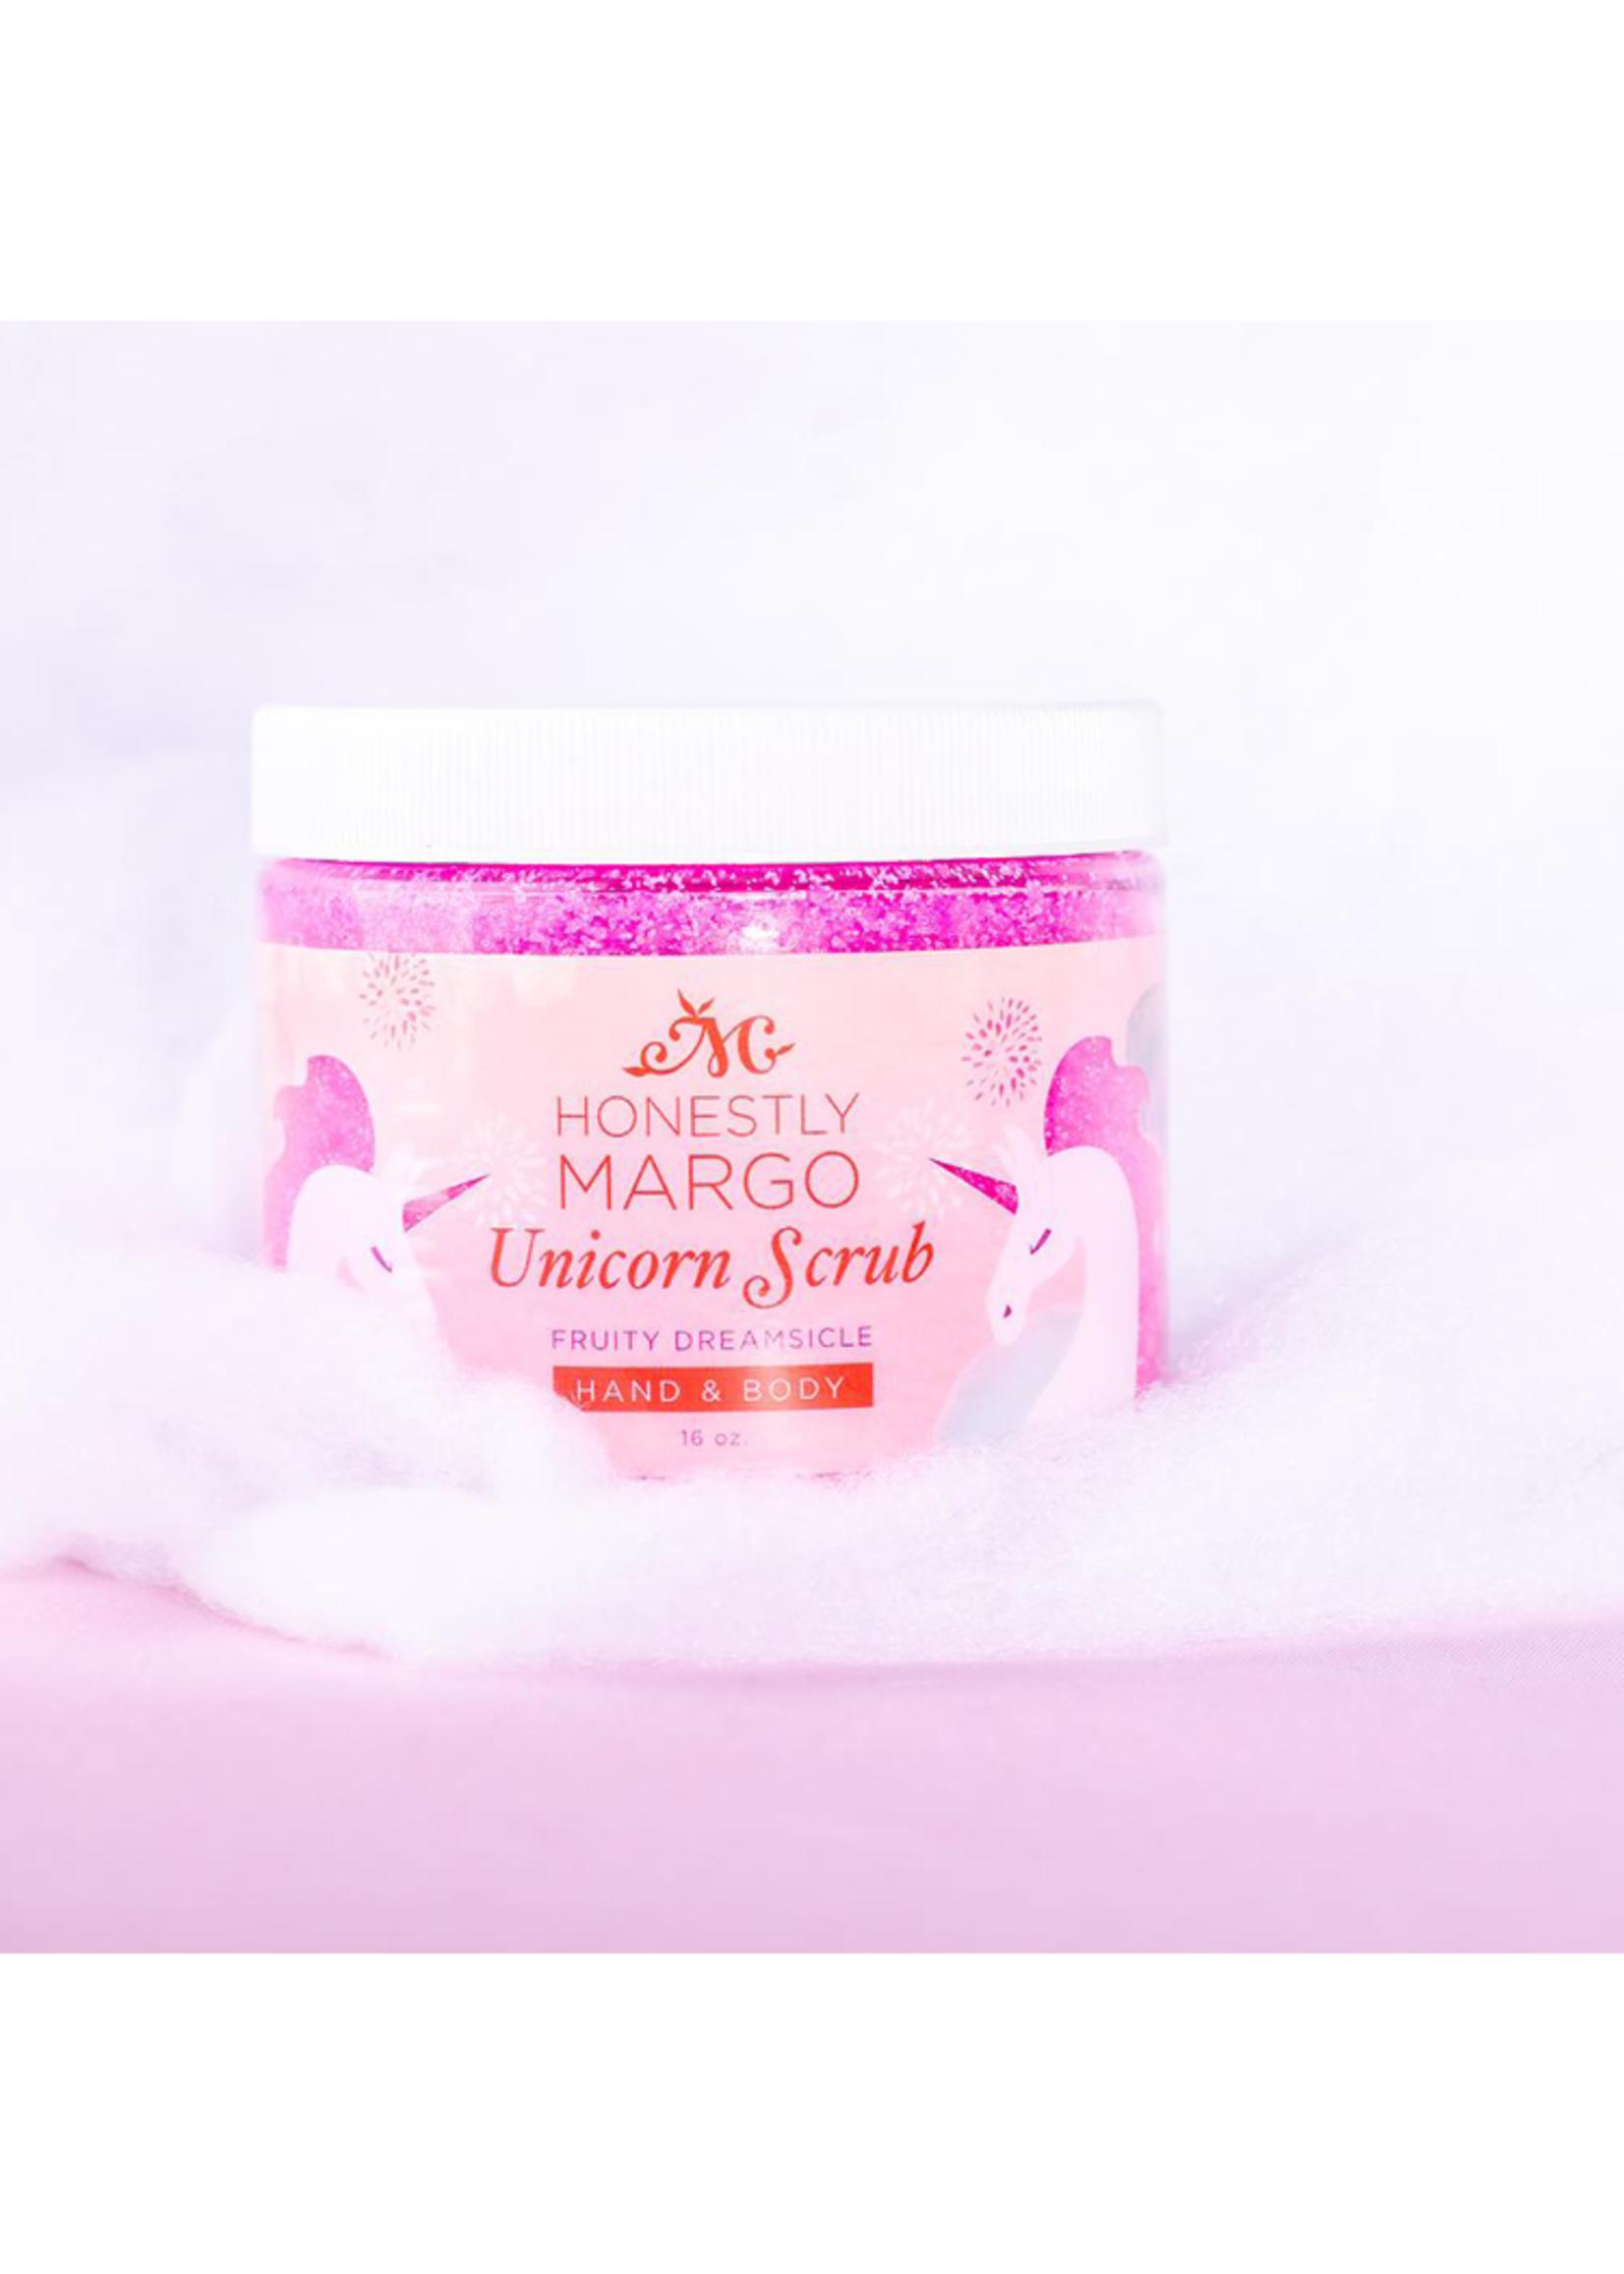 Honestly Margo Unicorn Fruity Dreamsicle Hand & Body Scrub